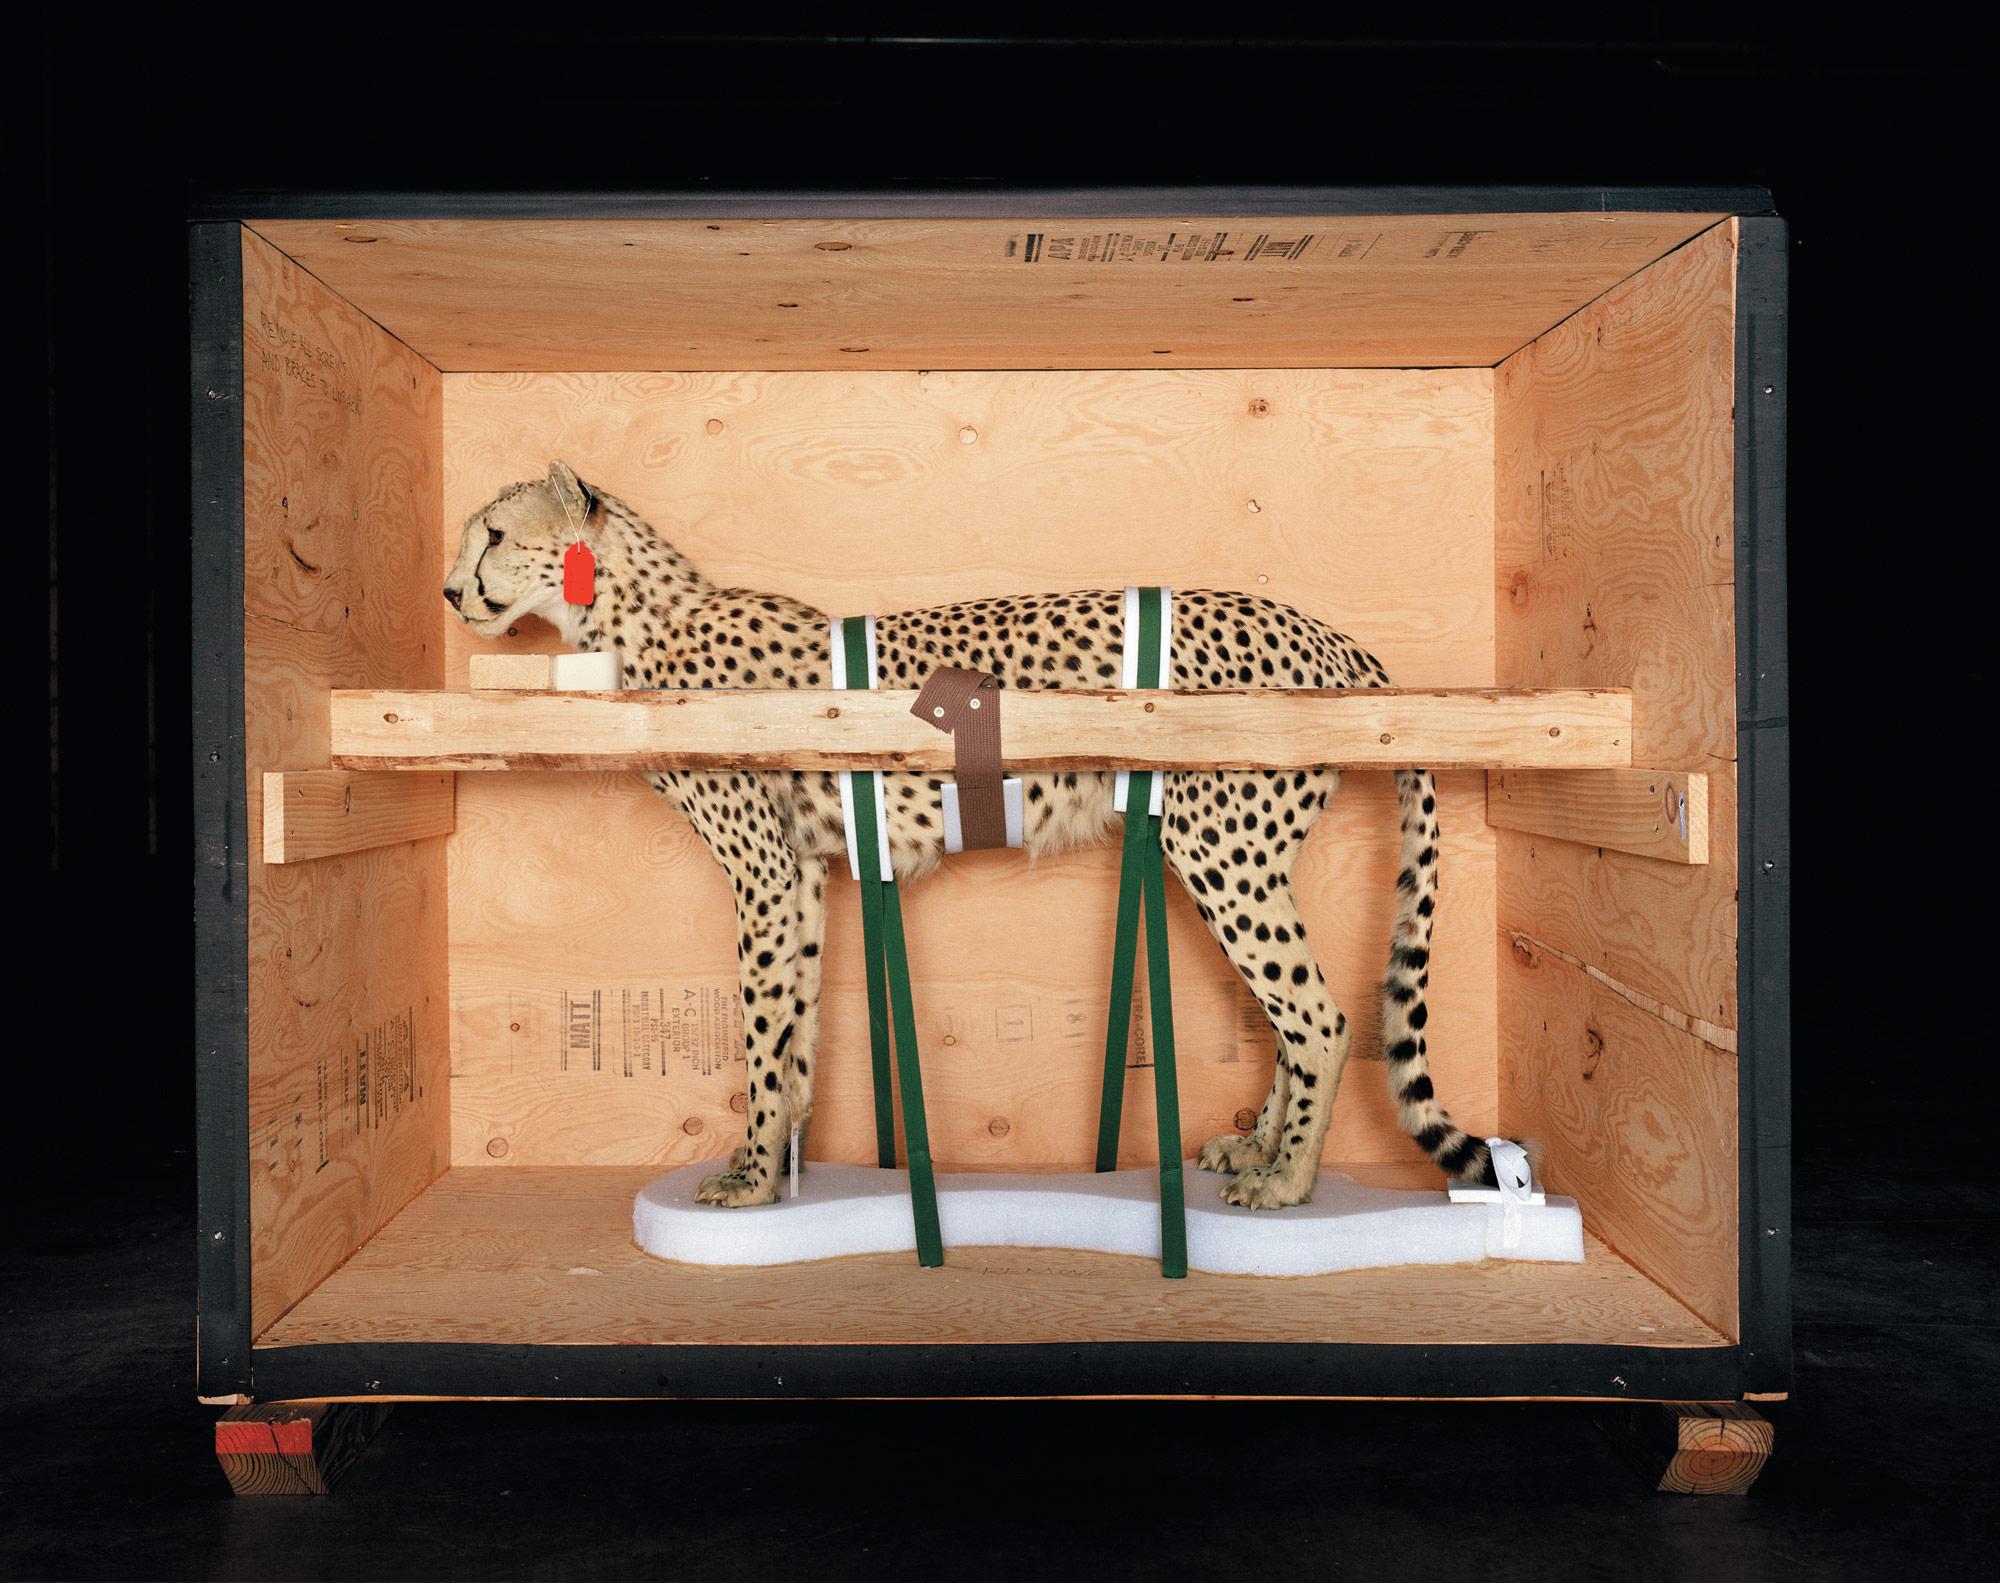 Smithsonian_Cheetah_CMYK.jpg